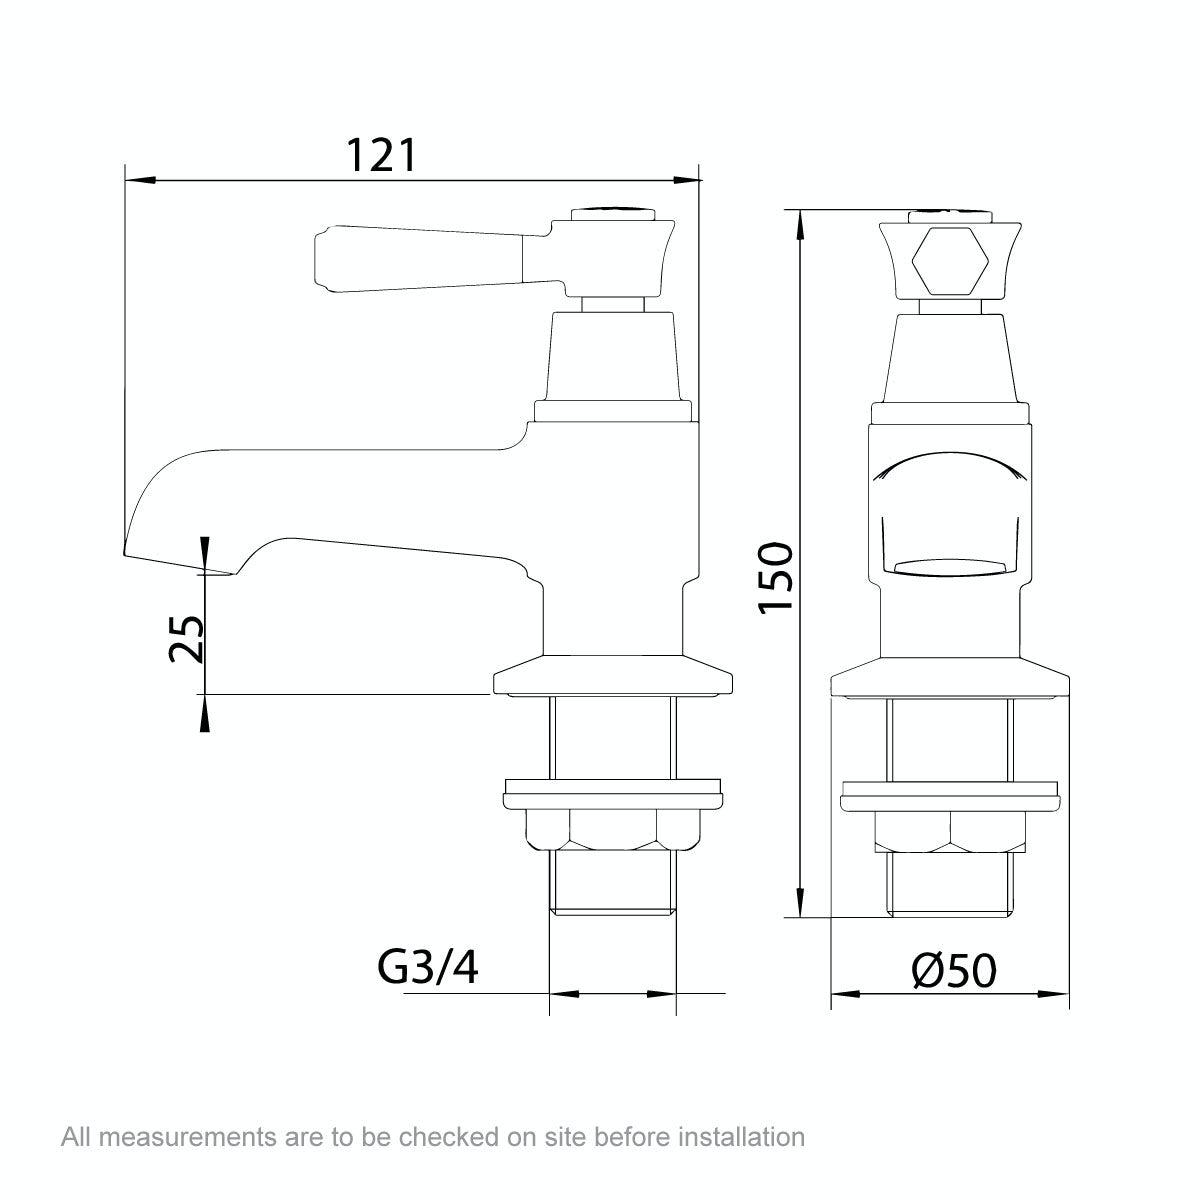 Dimensions for The Bath Co. Beaumont lever bath pillar taps